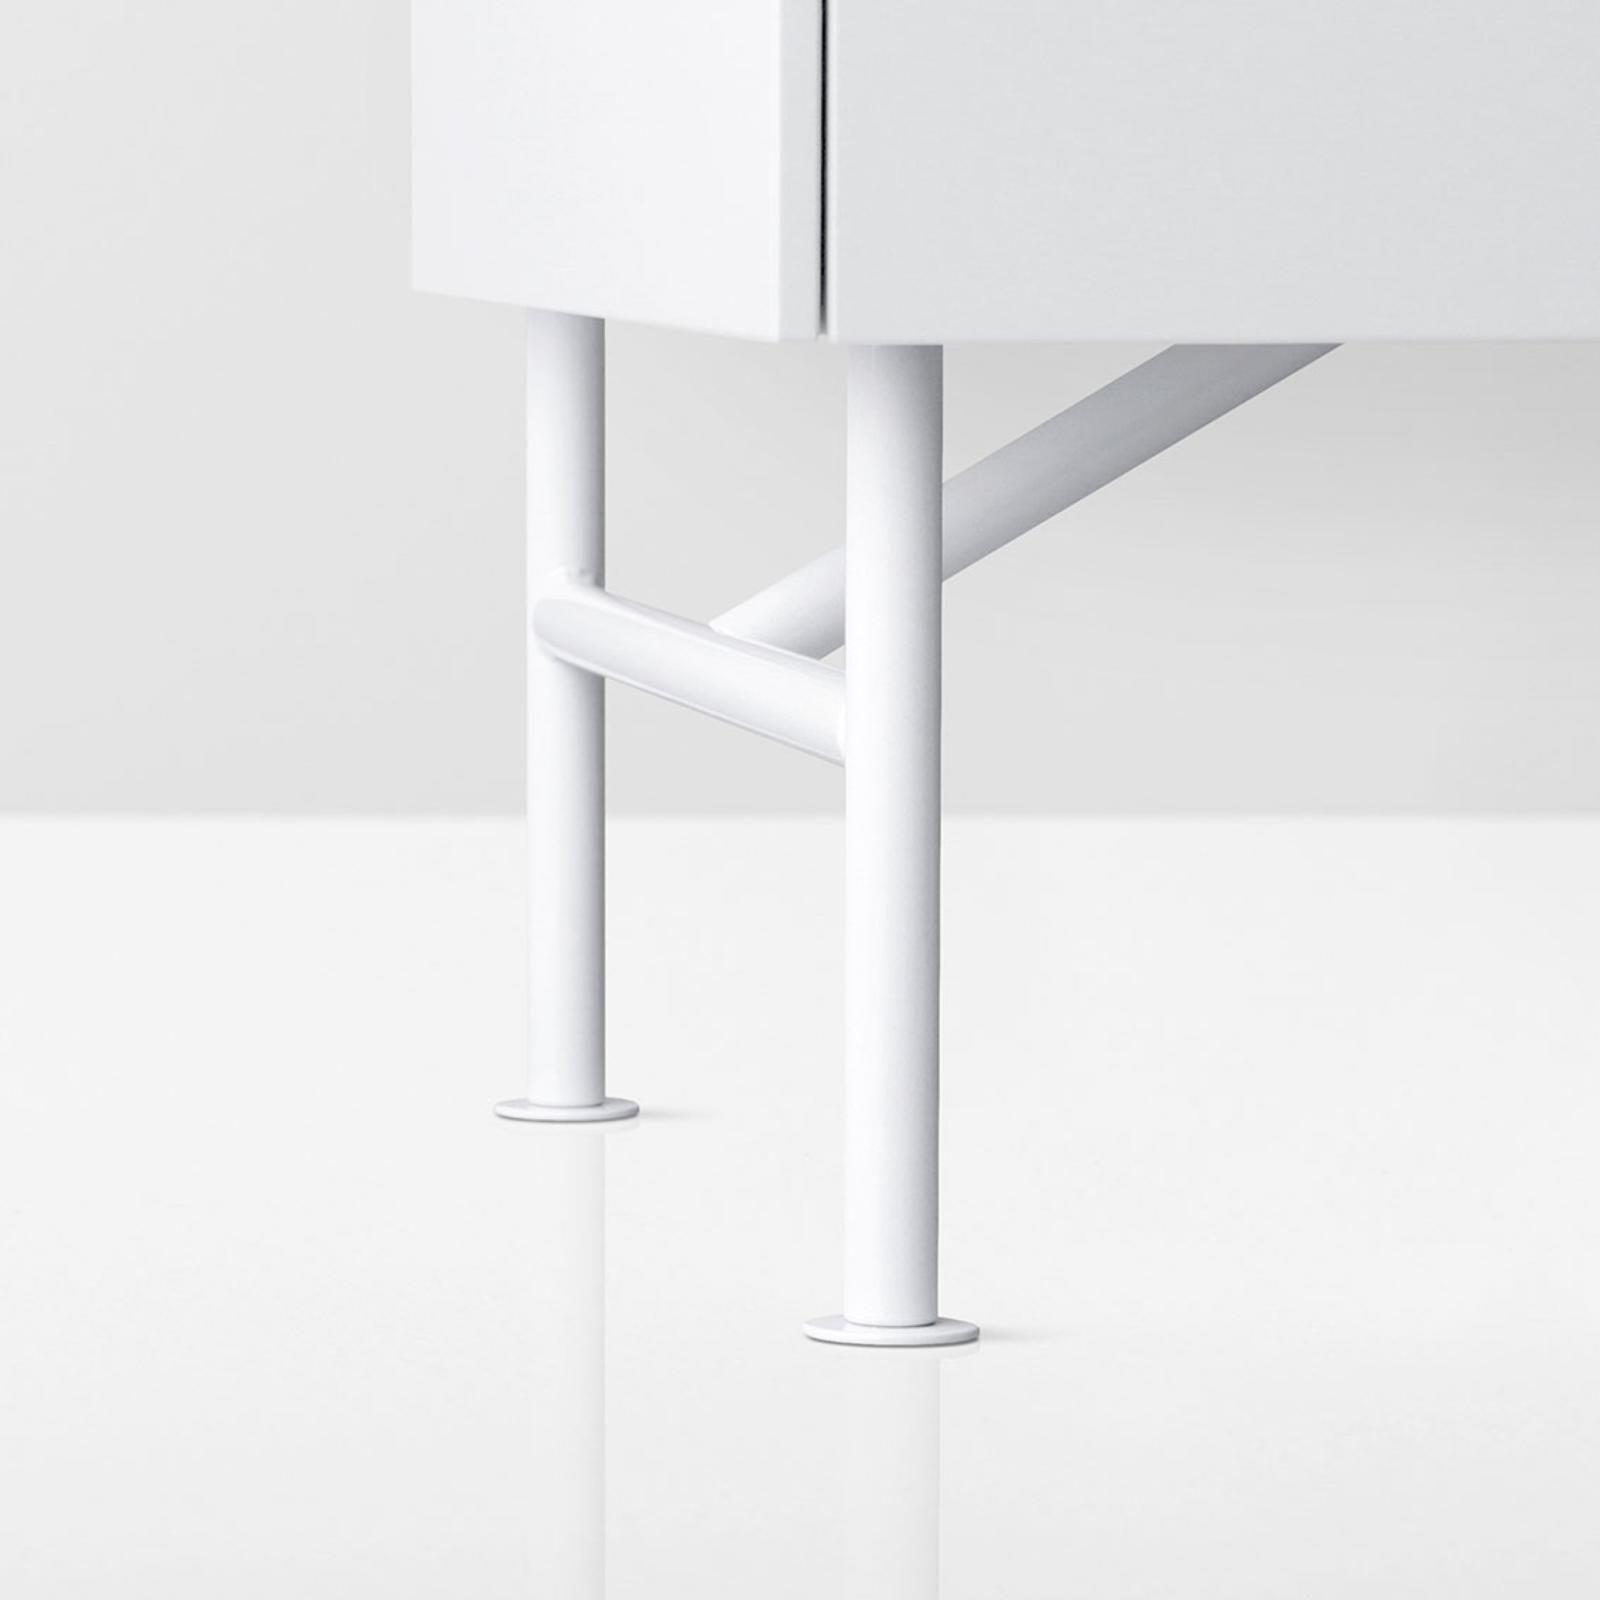 Superfront Angles Low Leg Furniture Legs Furniture Hacks Furniture